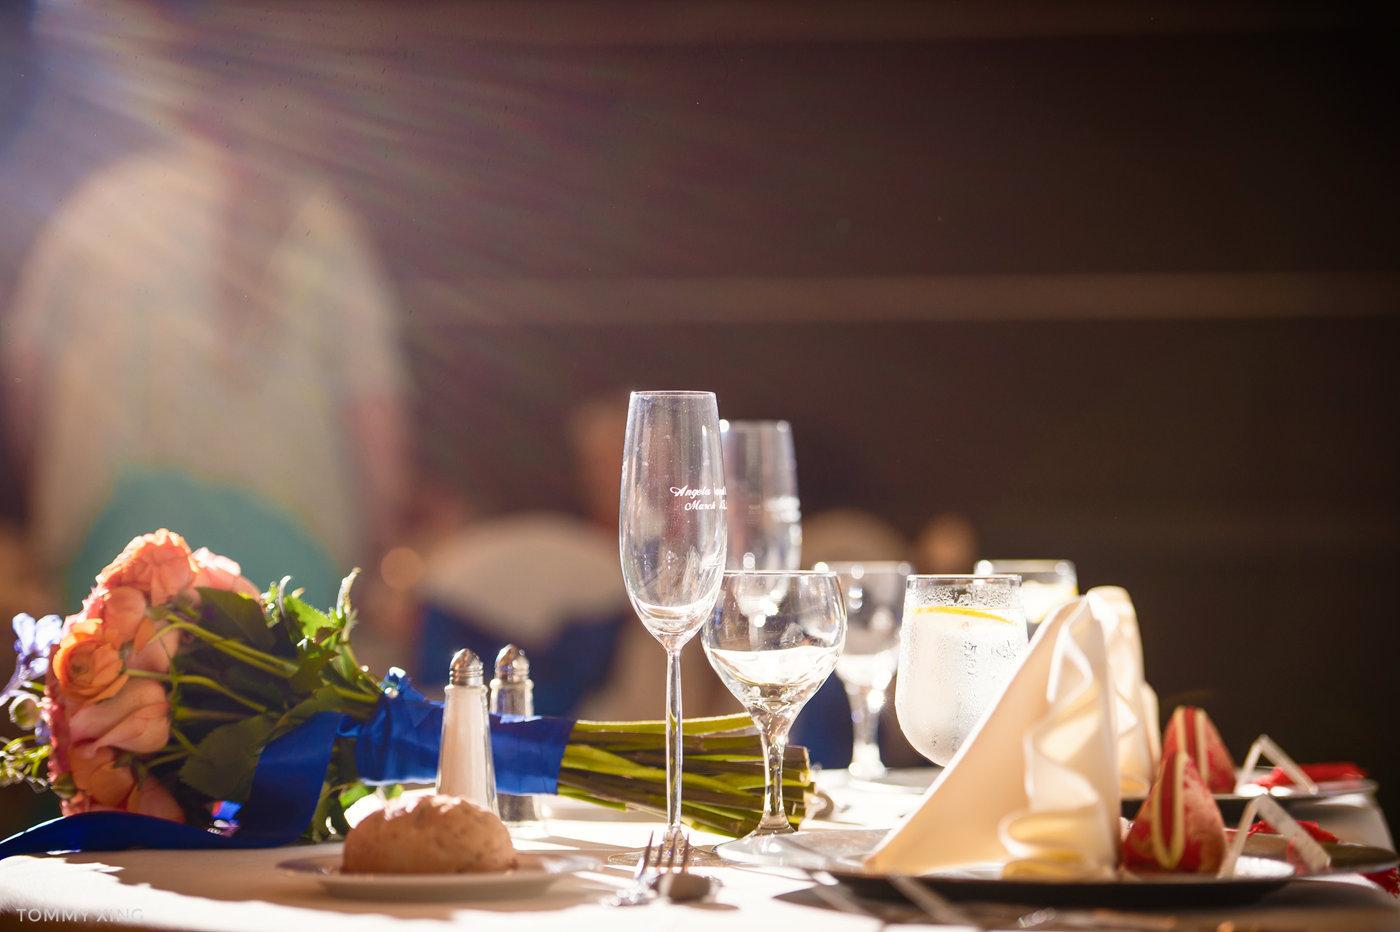 STANFORD MEMORIAL CHURCH WEDDING - Wenjie & Chengcheng - SAN FRANCISCO BAY AREA 斯坦福教堂婚礼跟拍 - 洛杉矶婚礼婚纱照摄影师 Tommy Xing Photography175.jpg